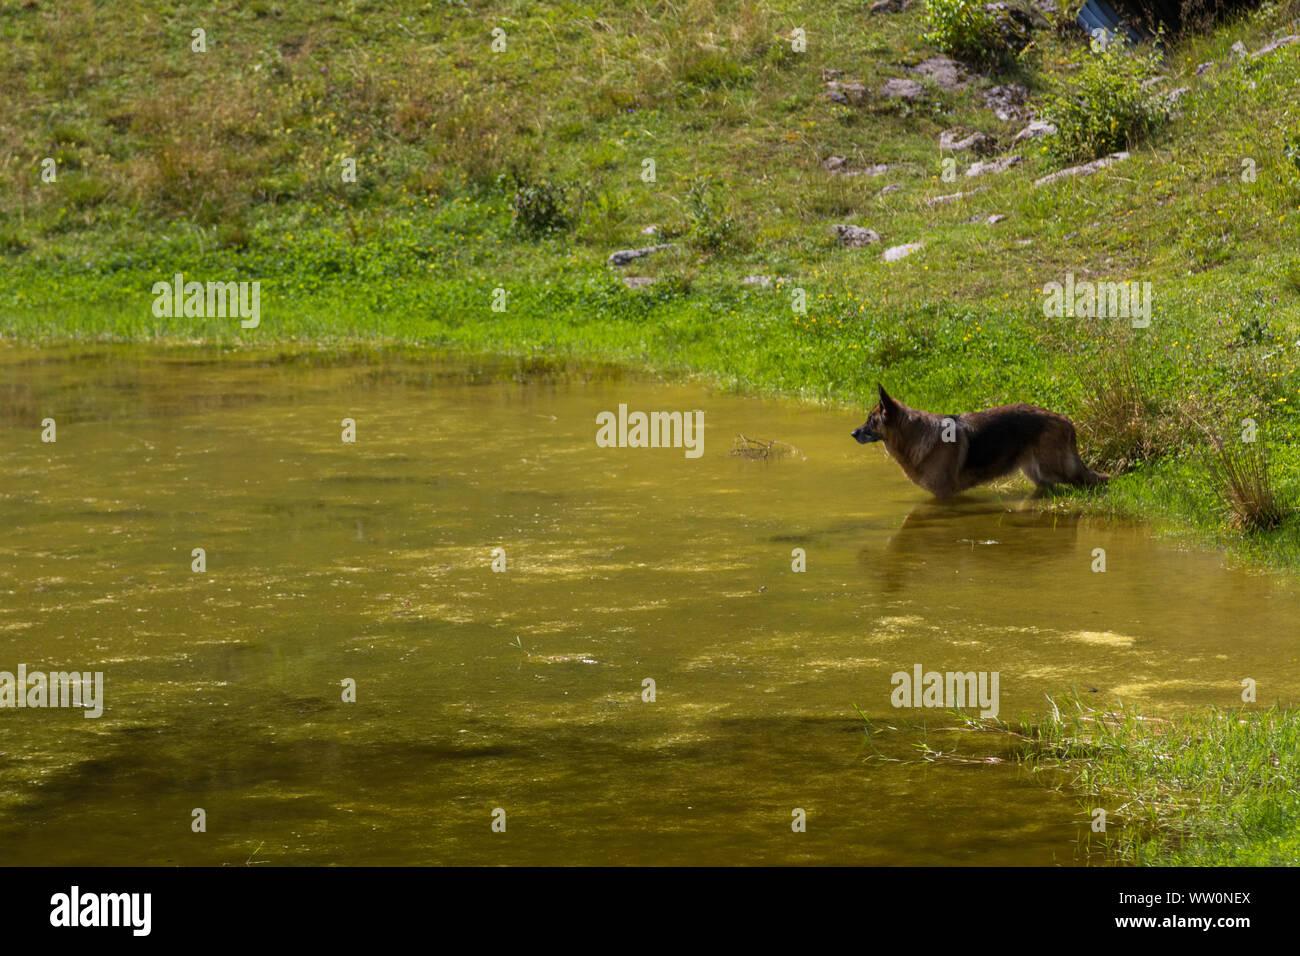 Beauty German shepherd dog in a mountain pond Stock Photo